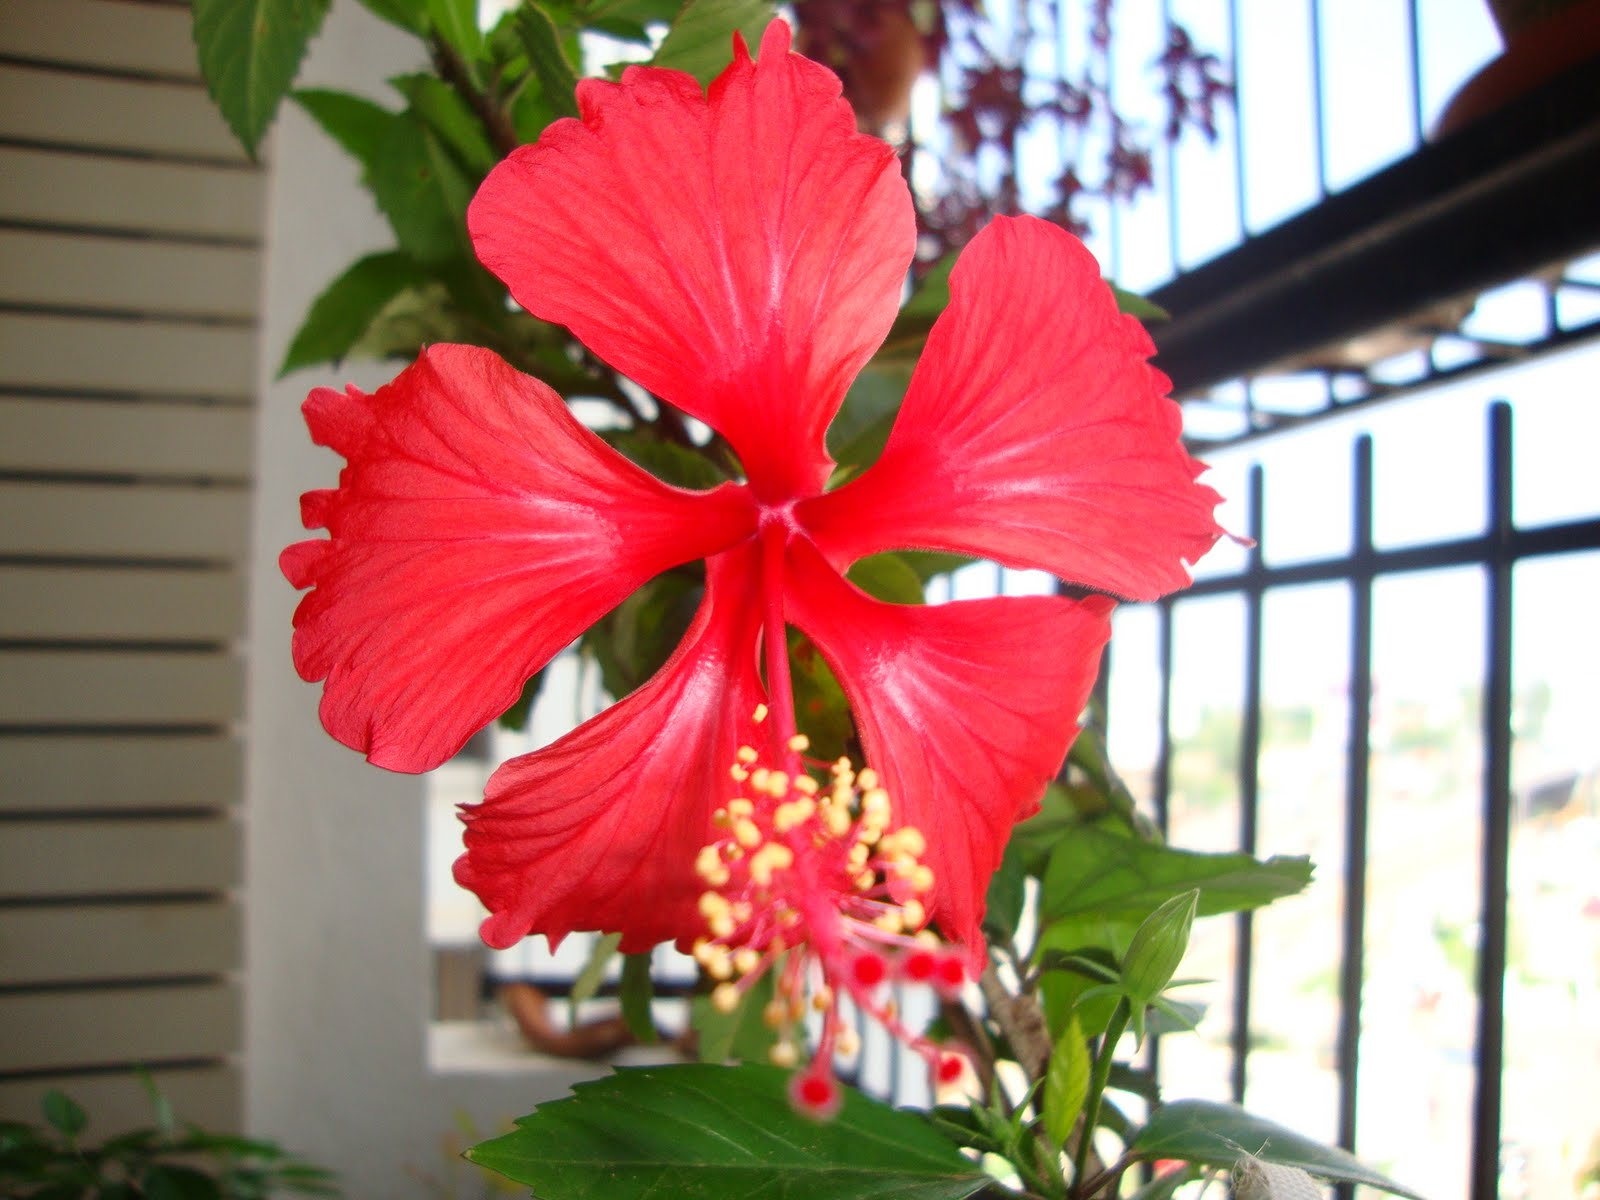 My balcony garden hibiscus experience part 1 hibiscus experience part 1 izmirmasajfo